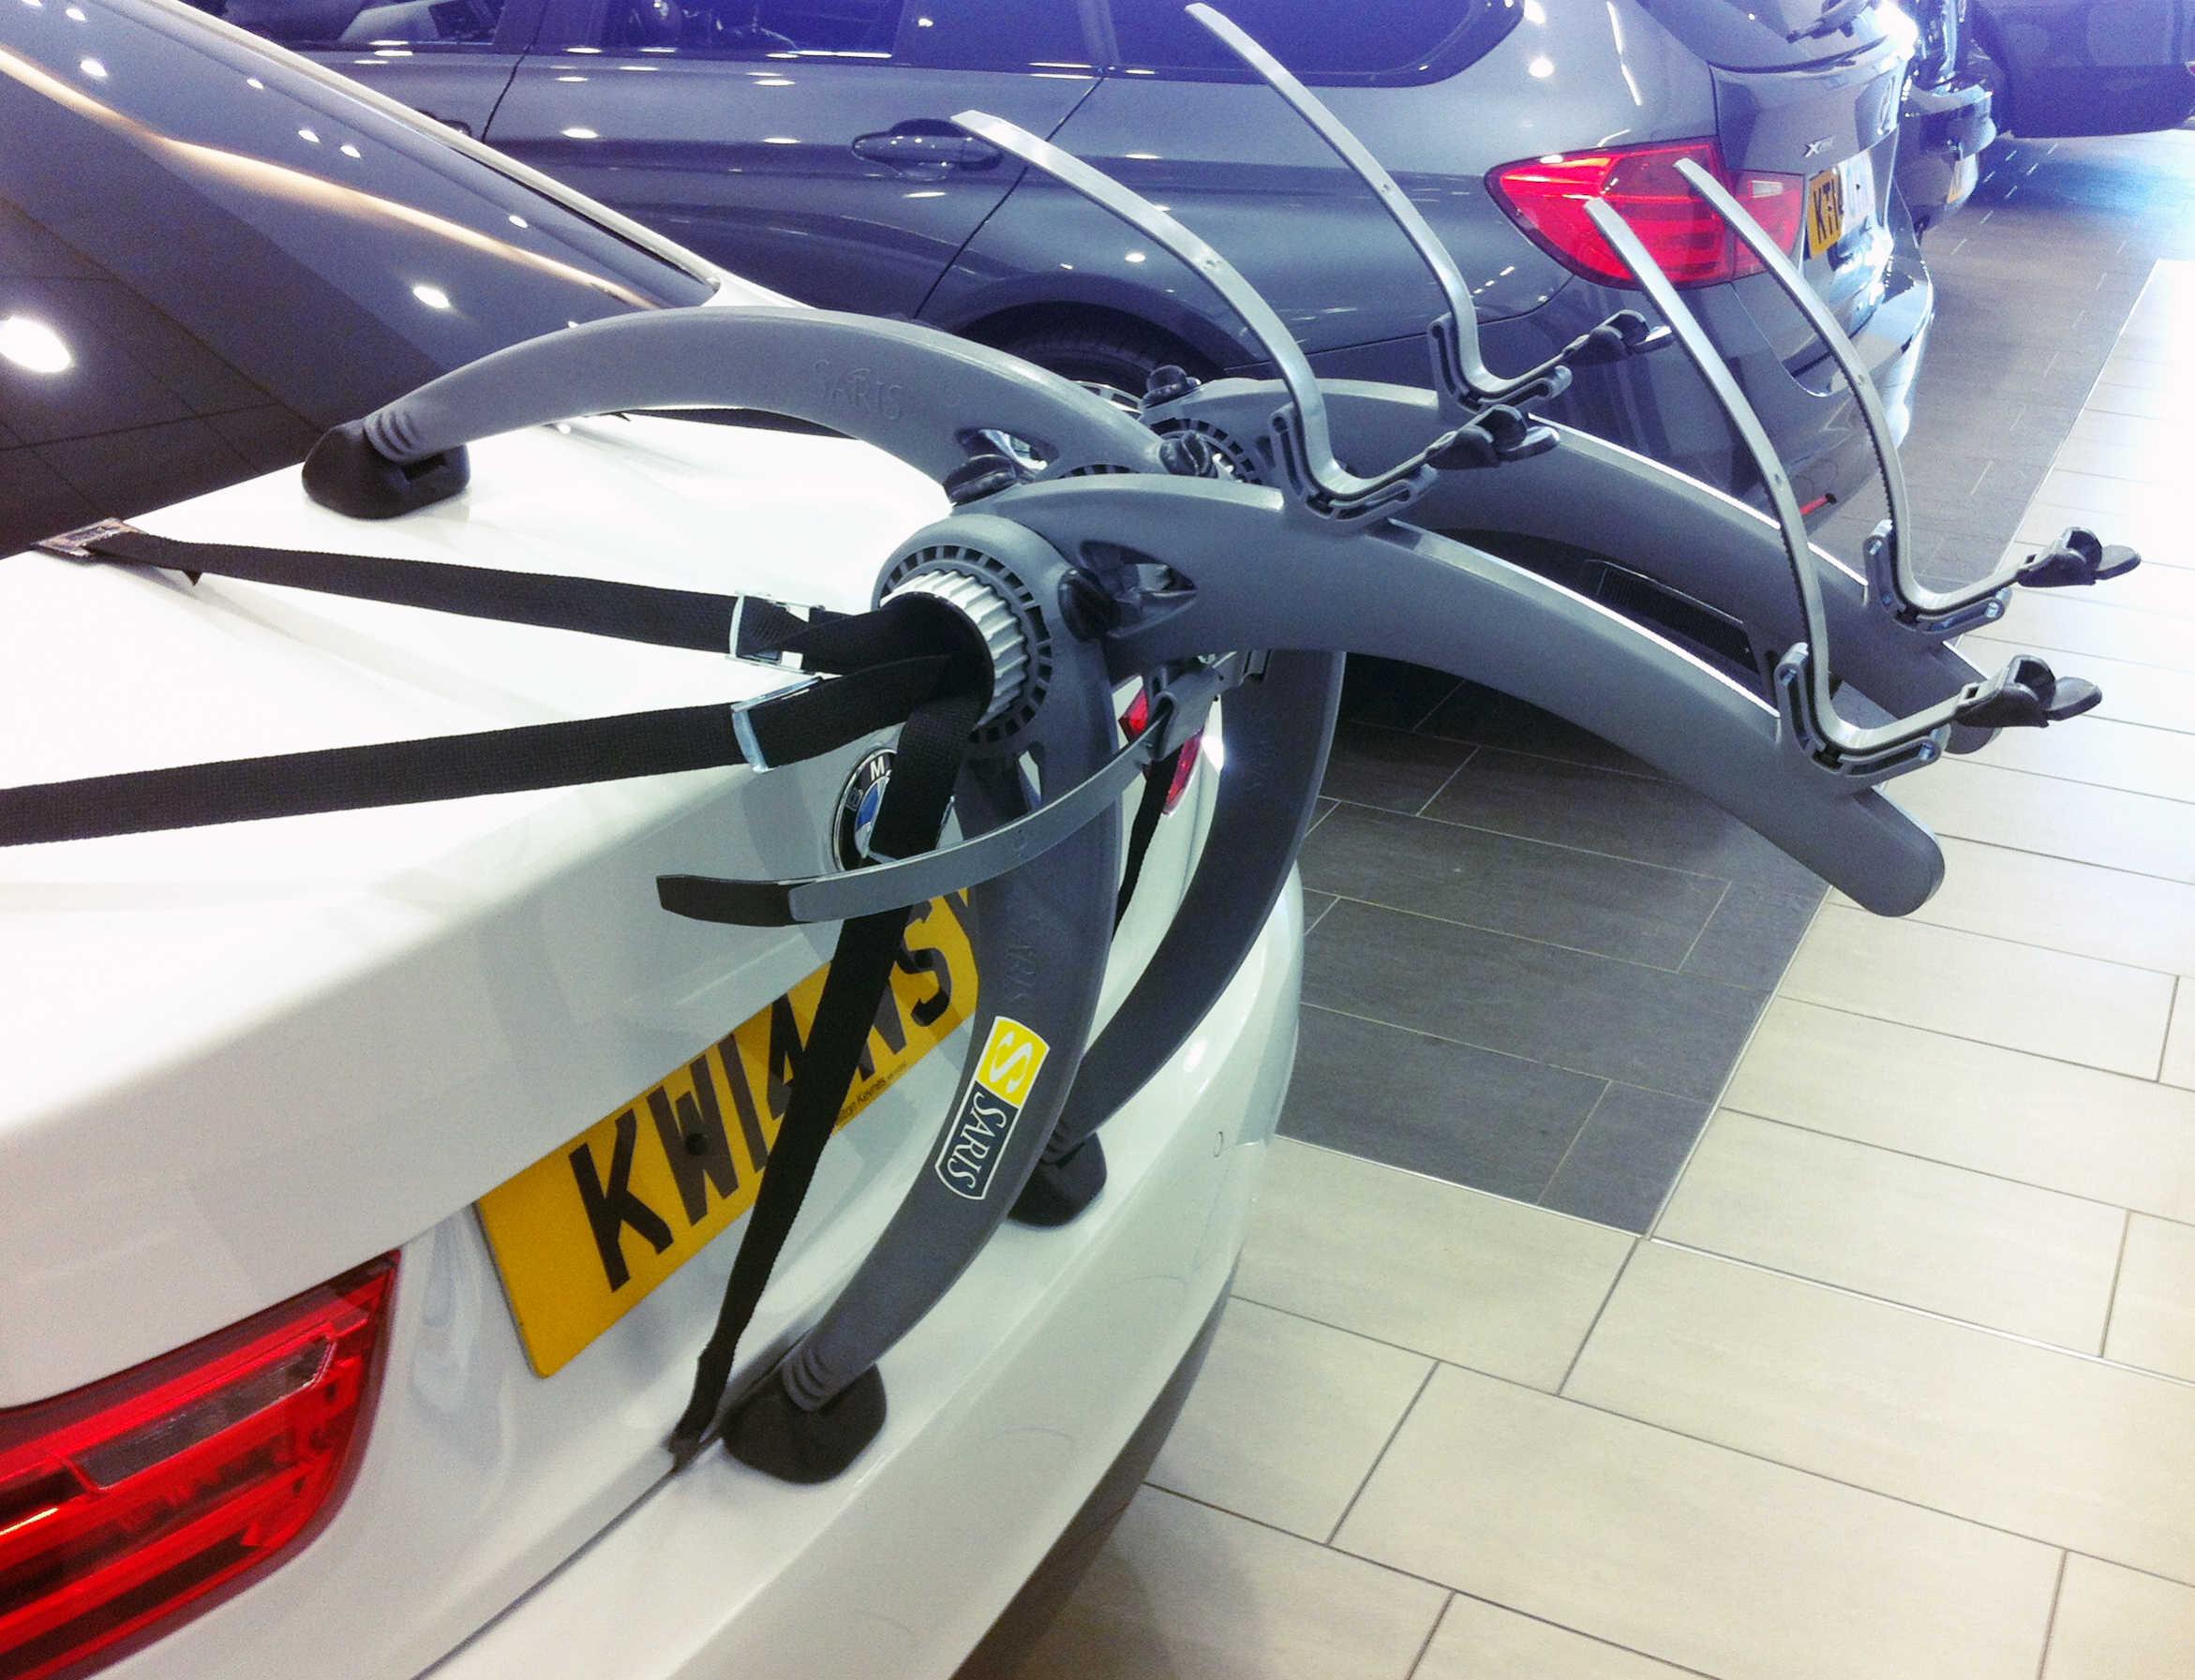 BMW 4 Series Bike Rack - Car Bike Racks & Bike Carriers